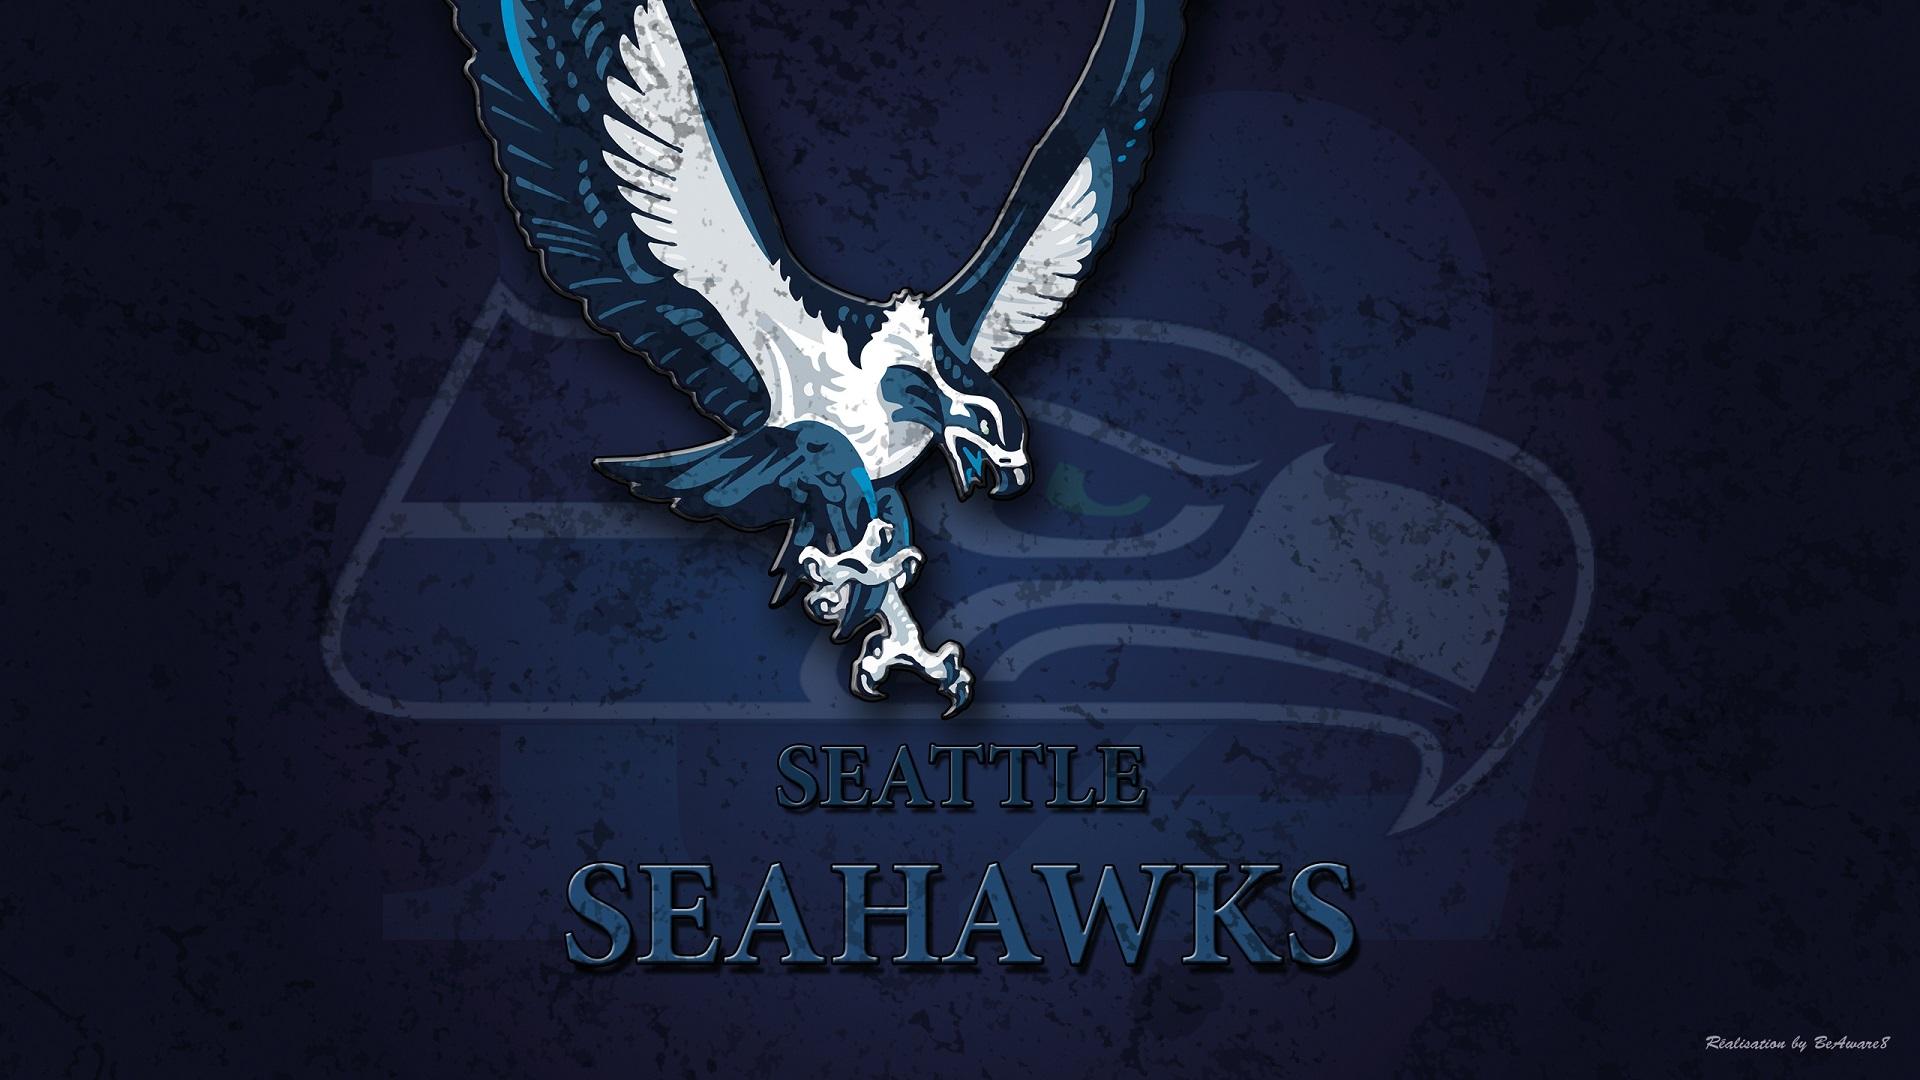 seattle seahawks schedule wallpaper wallpapersafari